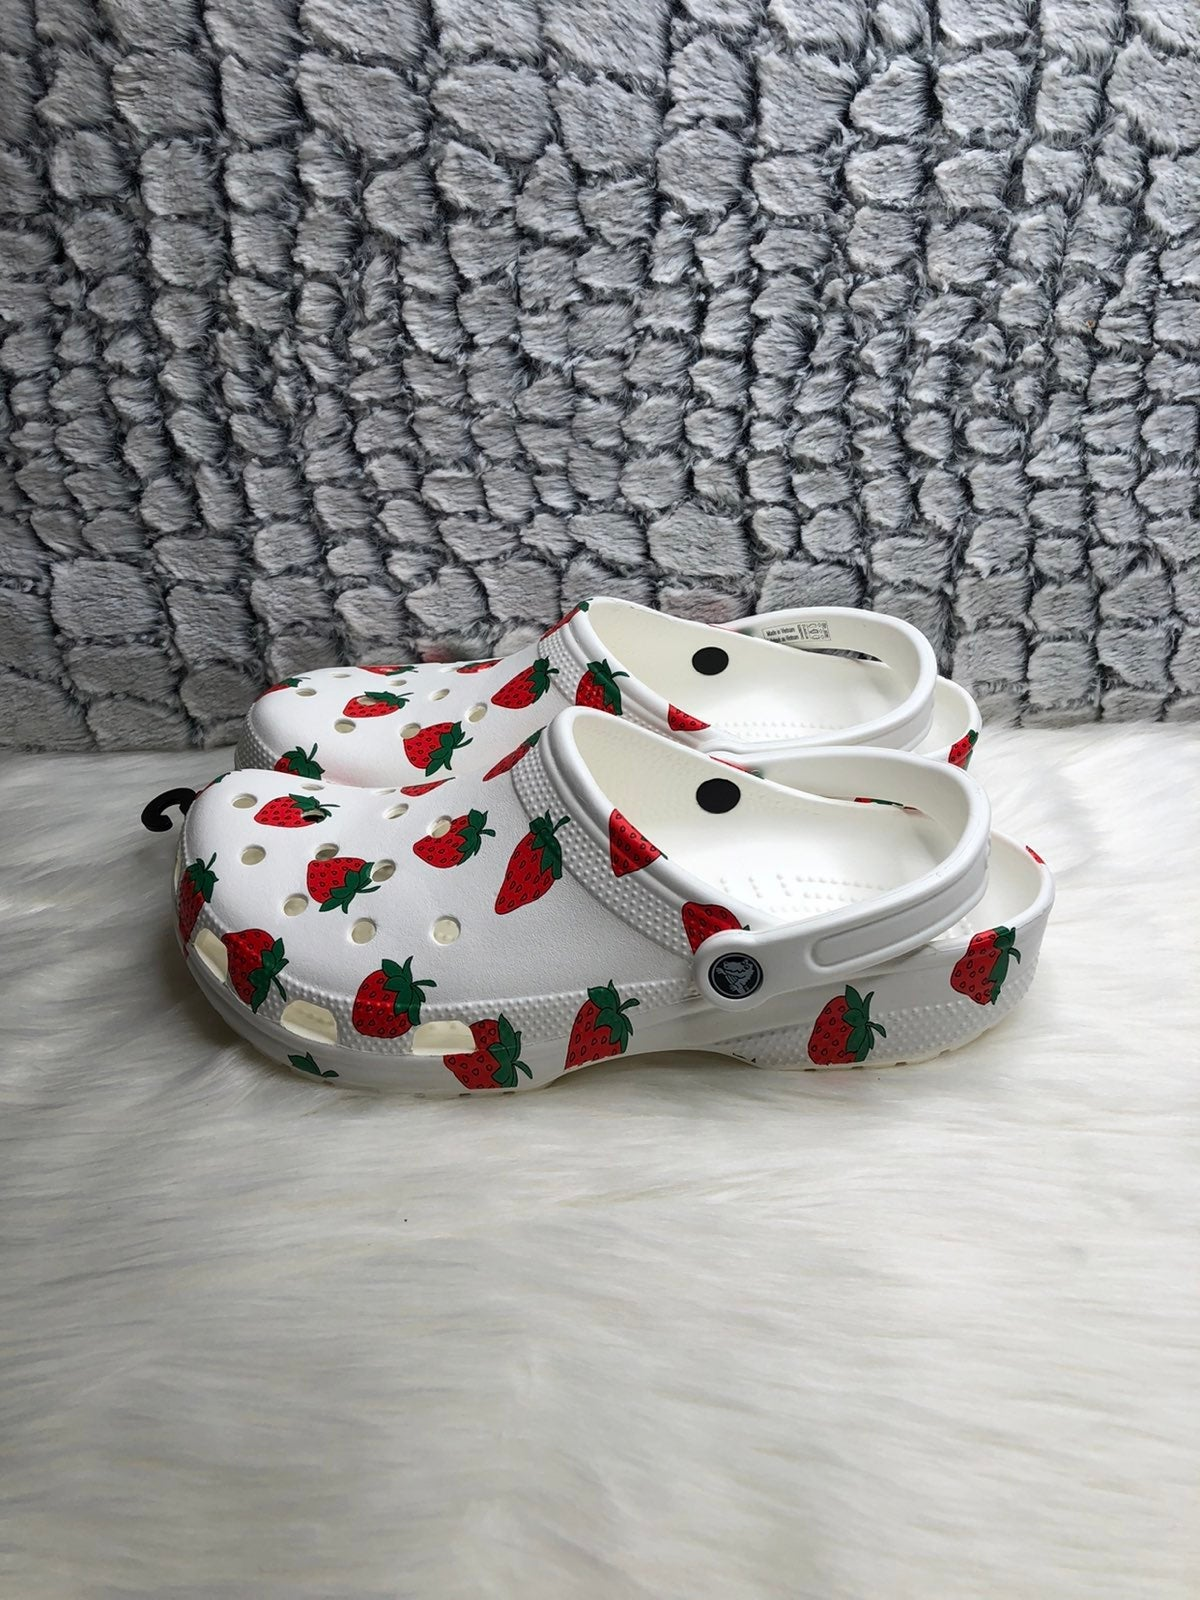 Crocs limited edition strawberry